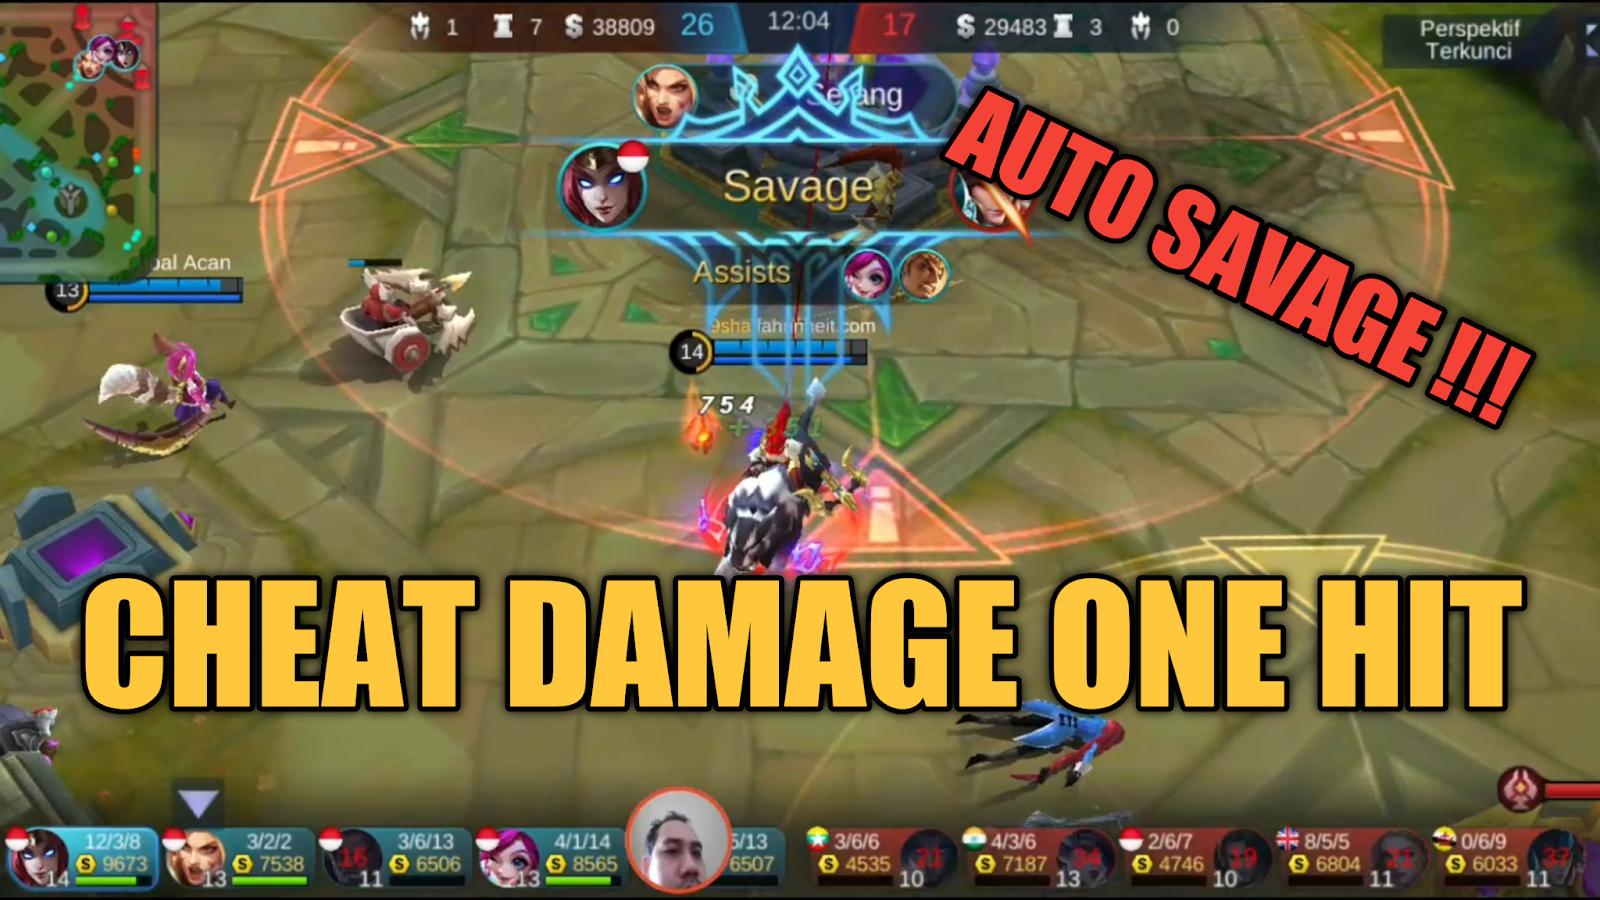 Script Damage Up 99% All Hero Mobile Legend (Auto Sakit  Auto Savage)